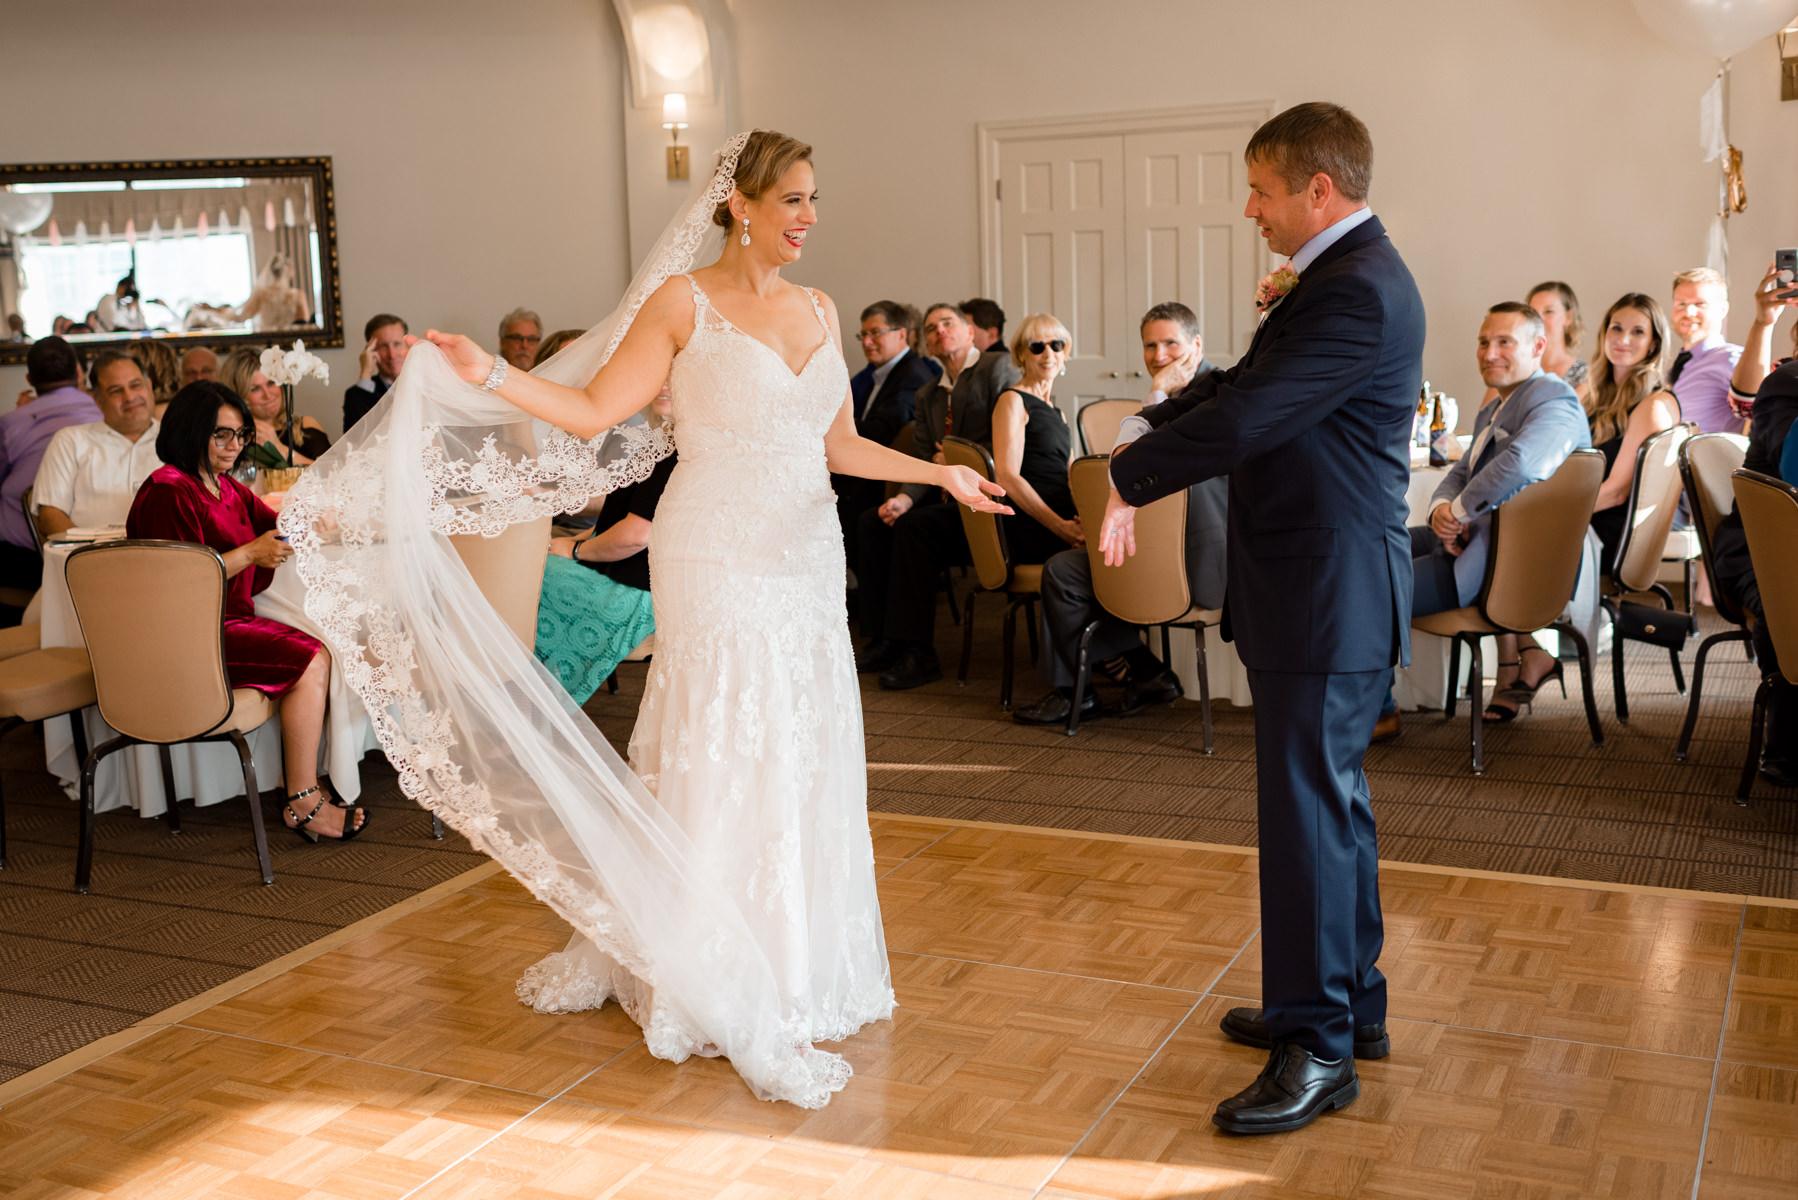 Andrew Tat - Documentary Wedding Photography - Hotel Sorrento - Seattle, Washington -Jessica & Paul - 30.jpg